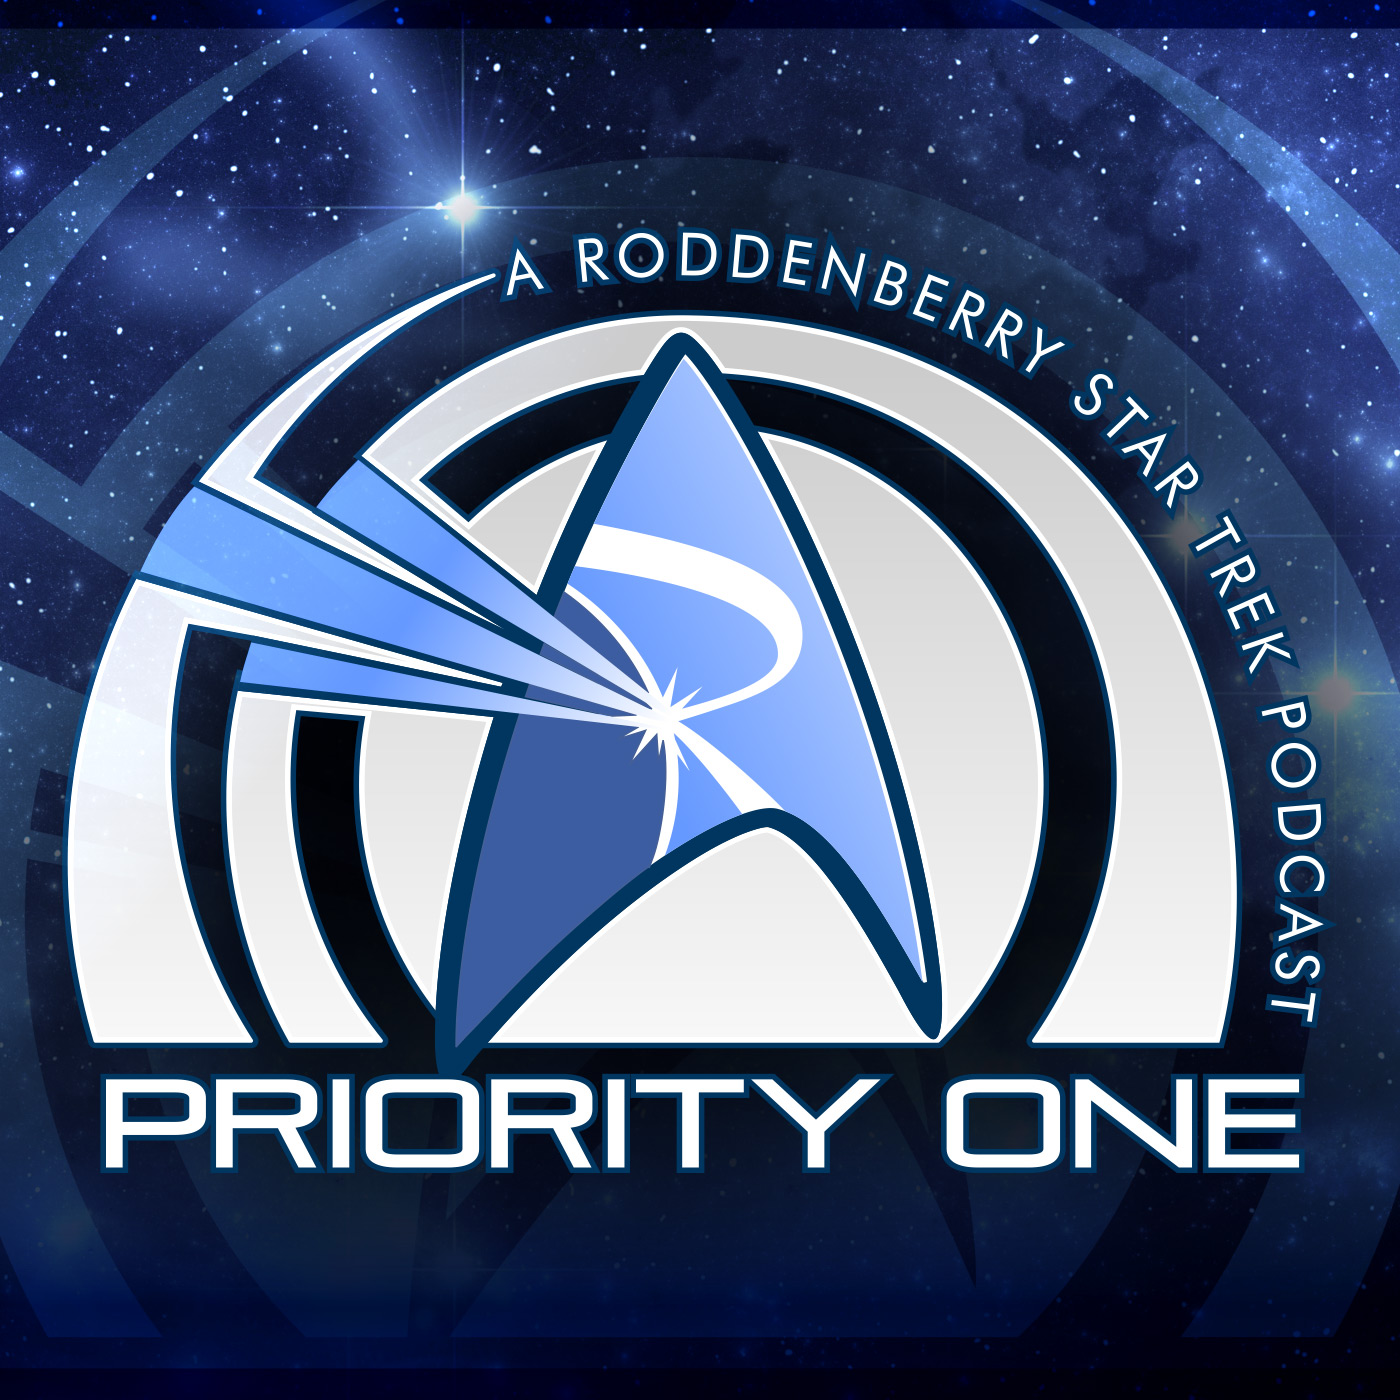 Artwork for 398 - #krazy4killy | Priority One: A Roddenberry Star Trek Podcast (Fixed)